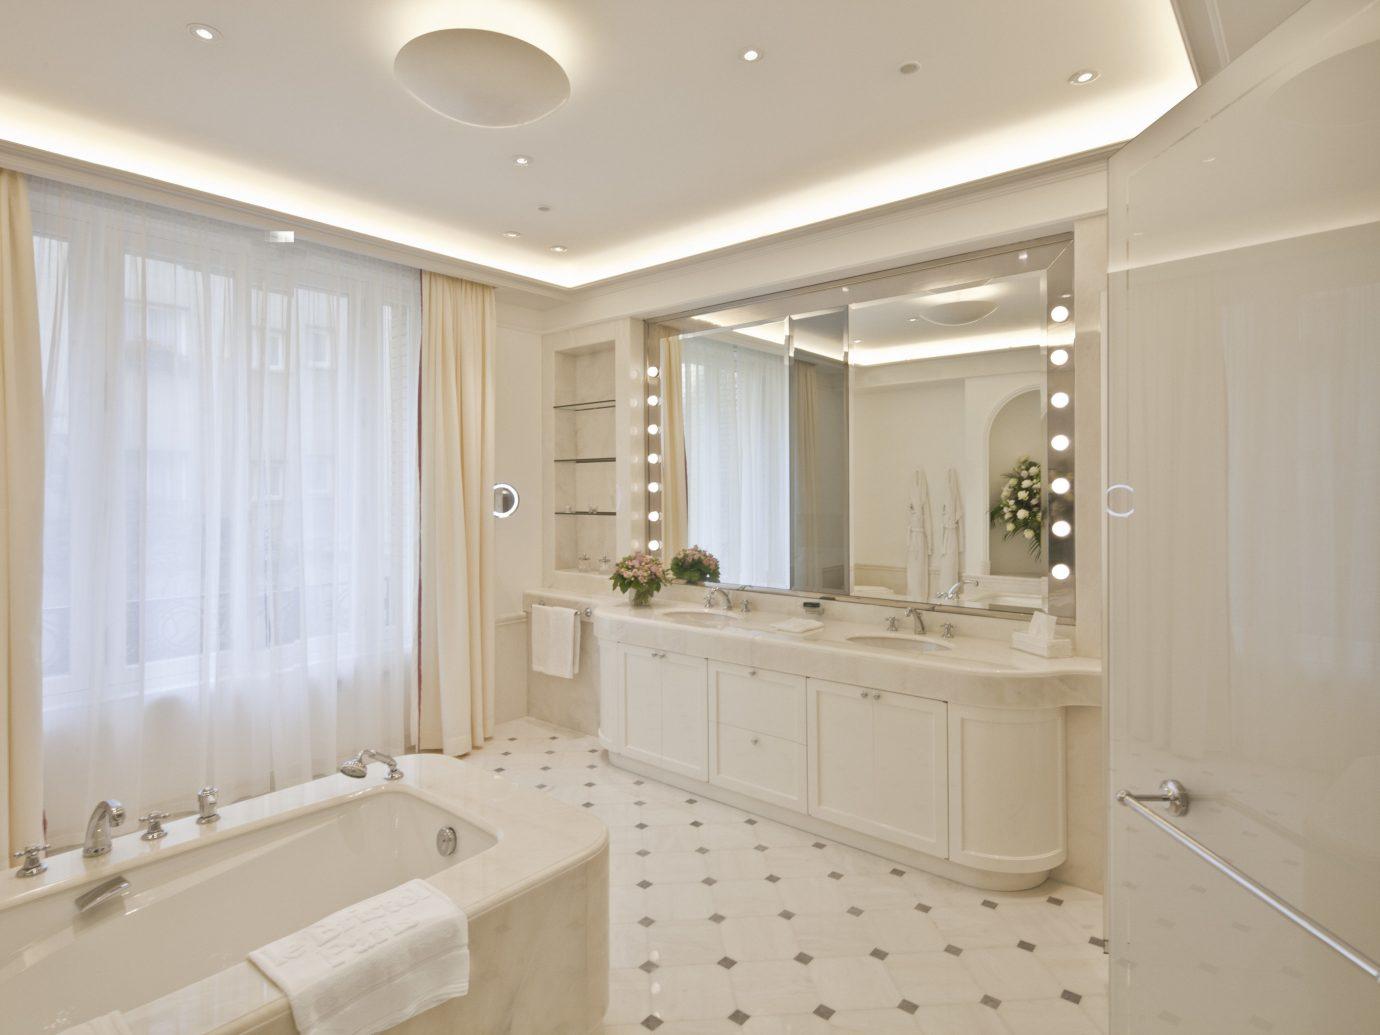 France Hotels Luxury Travel Paris indoor bathroom wall window floor ceiling room sink interior design home estate tub bathtub real estate flooring interior designer plumbing fixture Bath tile